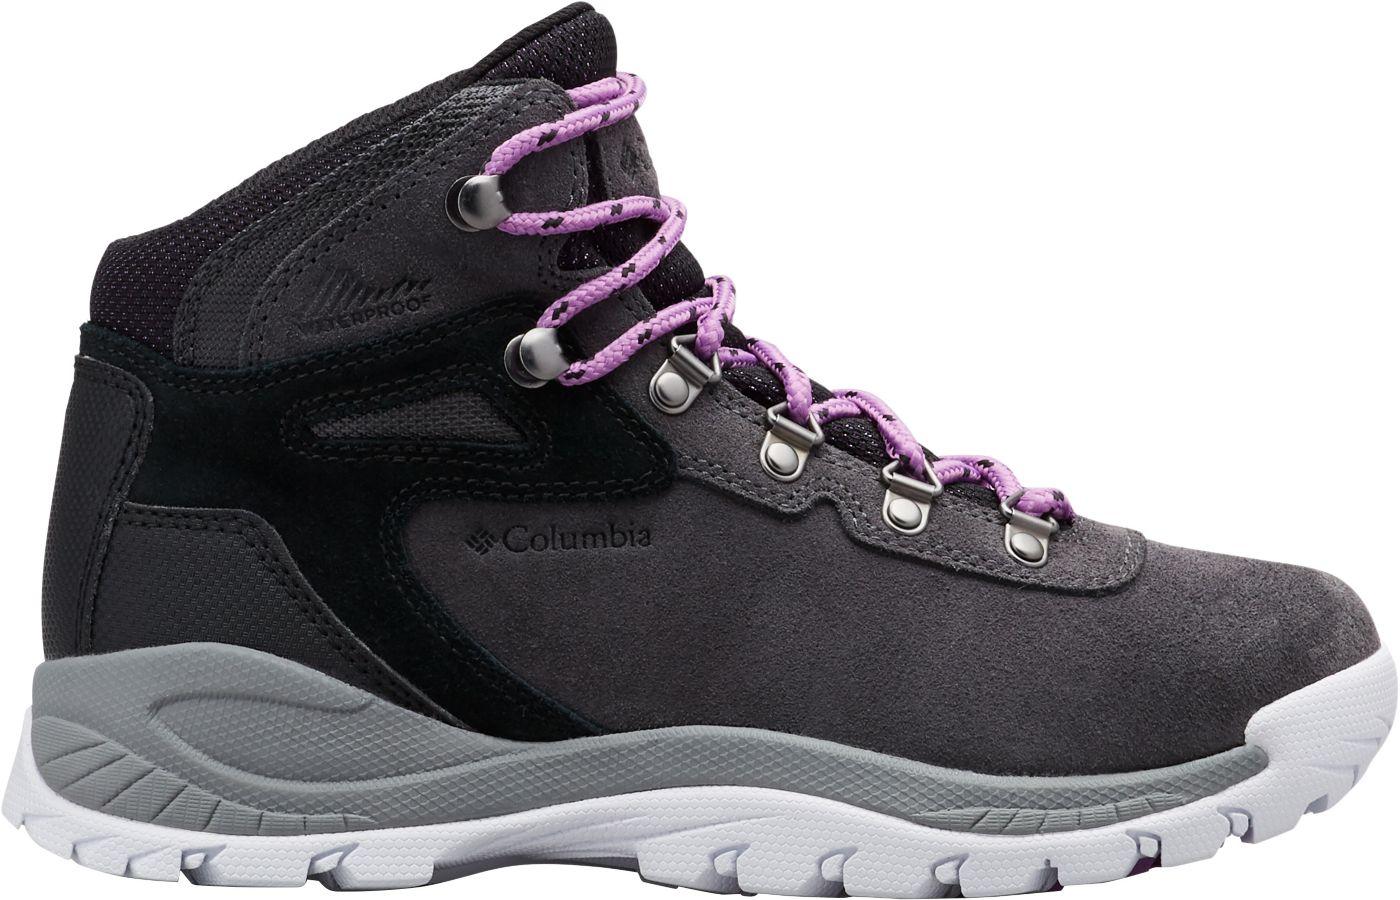 Columbia Women's Newton Ridge Plus Amped Waterproof Hiking Boots